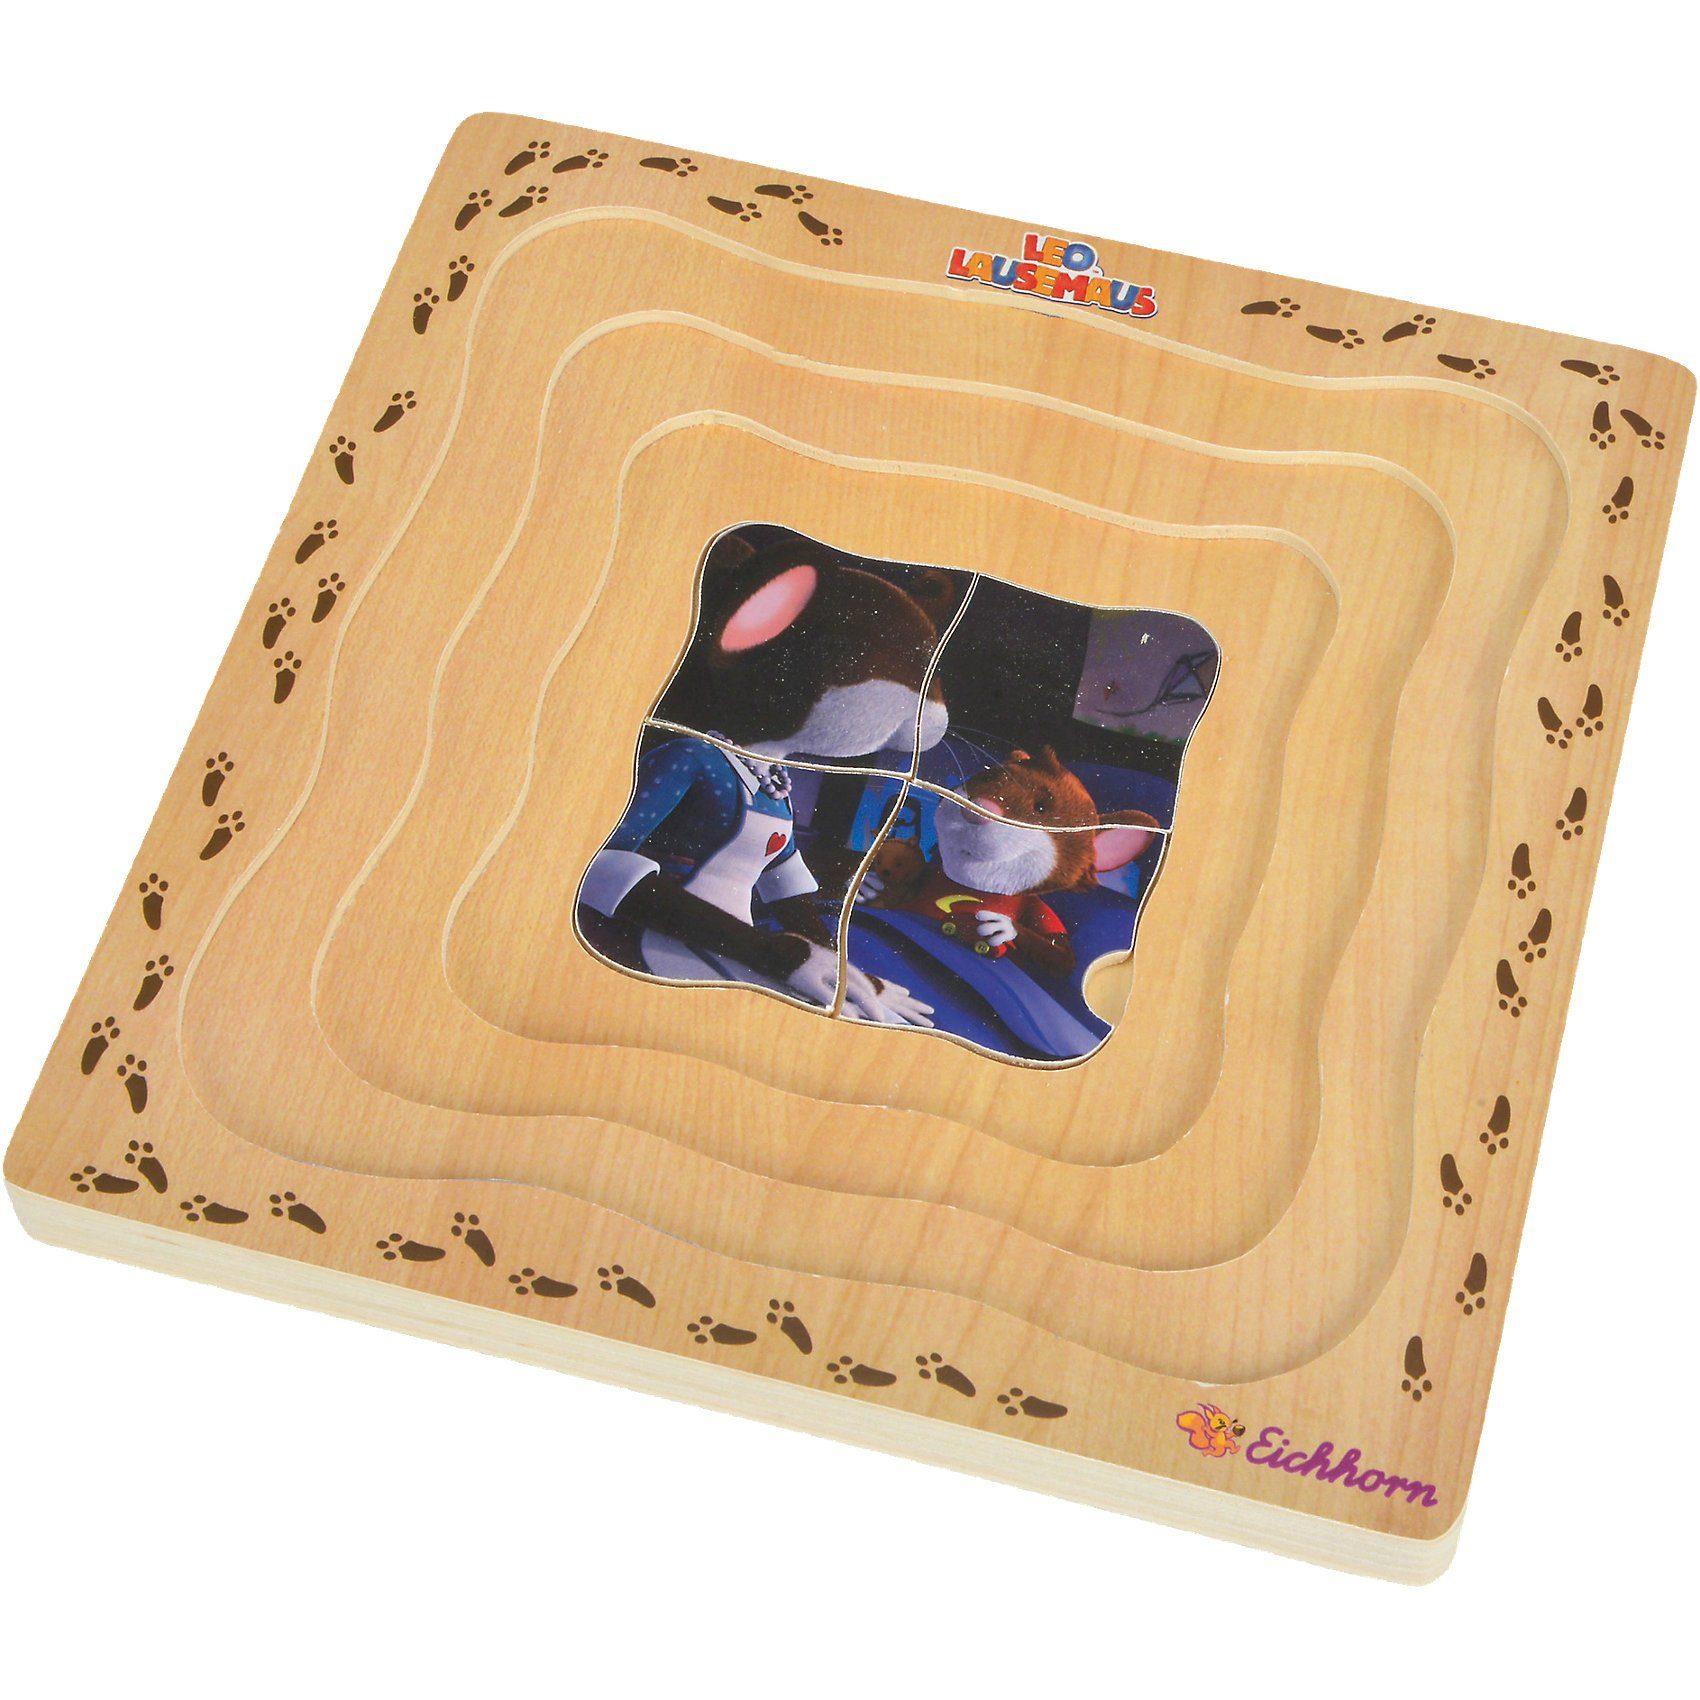 Eichhorn LEO Ebenen Puzzle